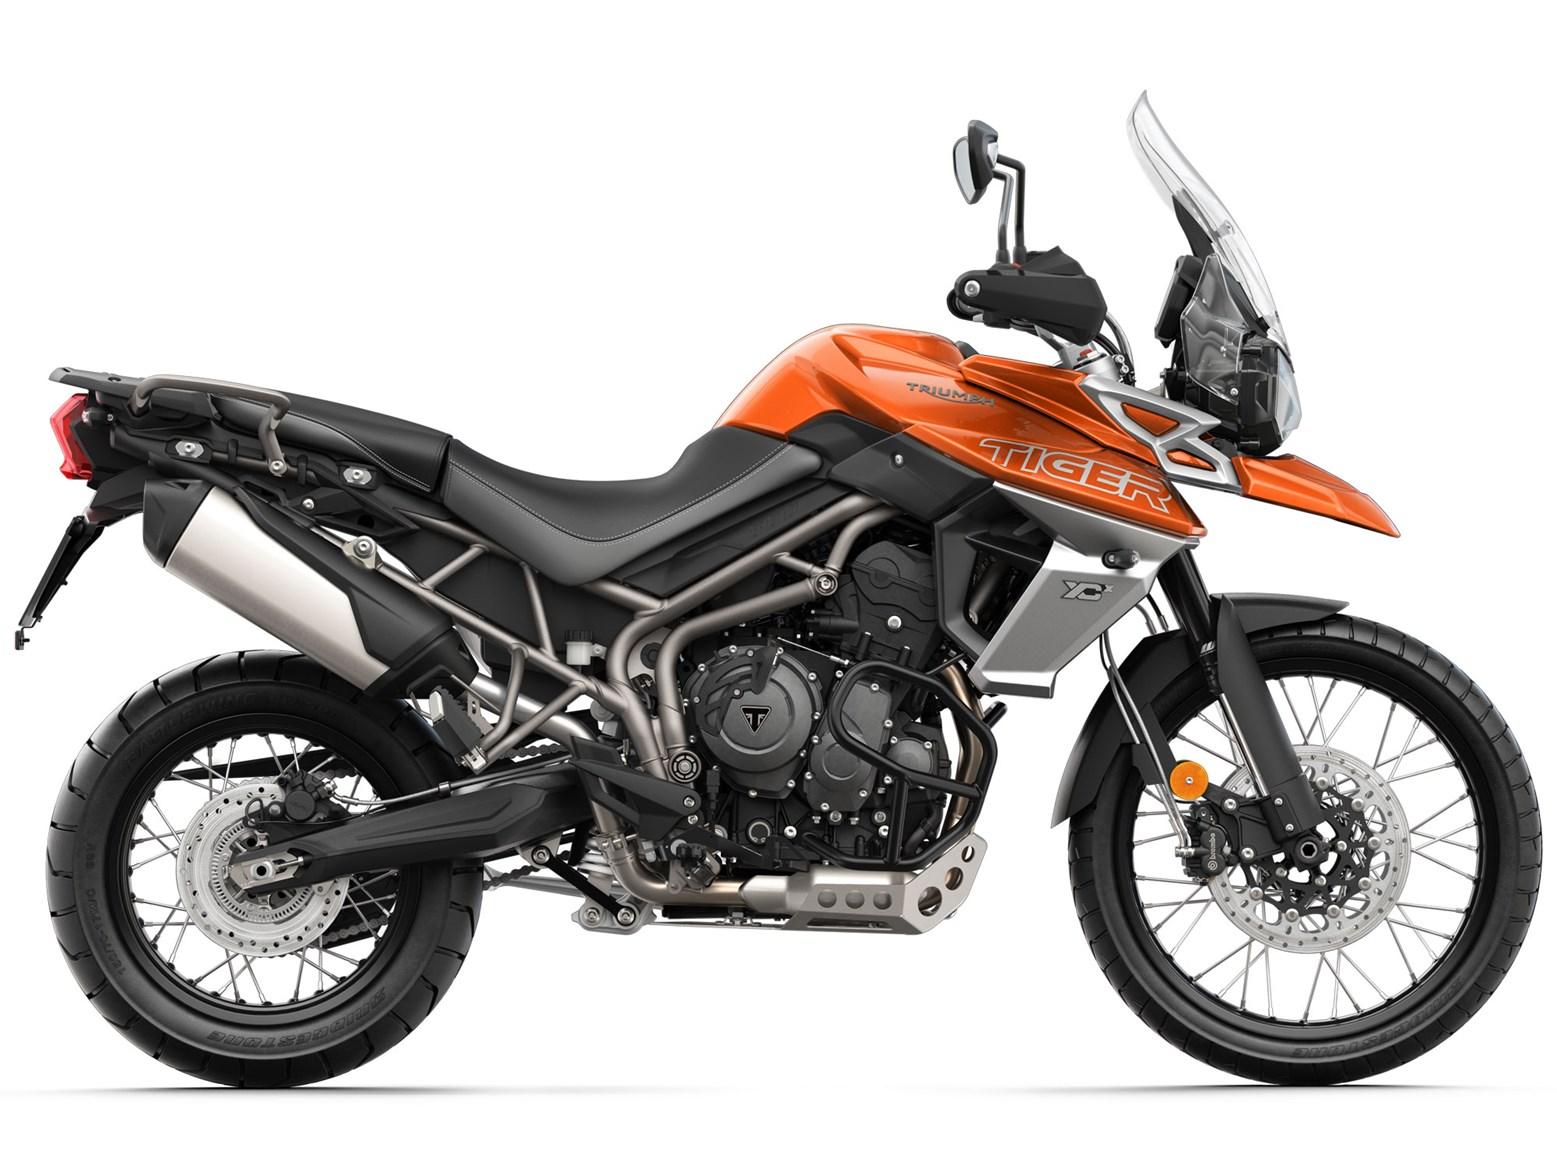 Tiger-800-XCX-orange